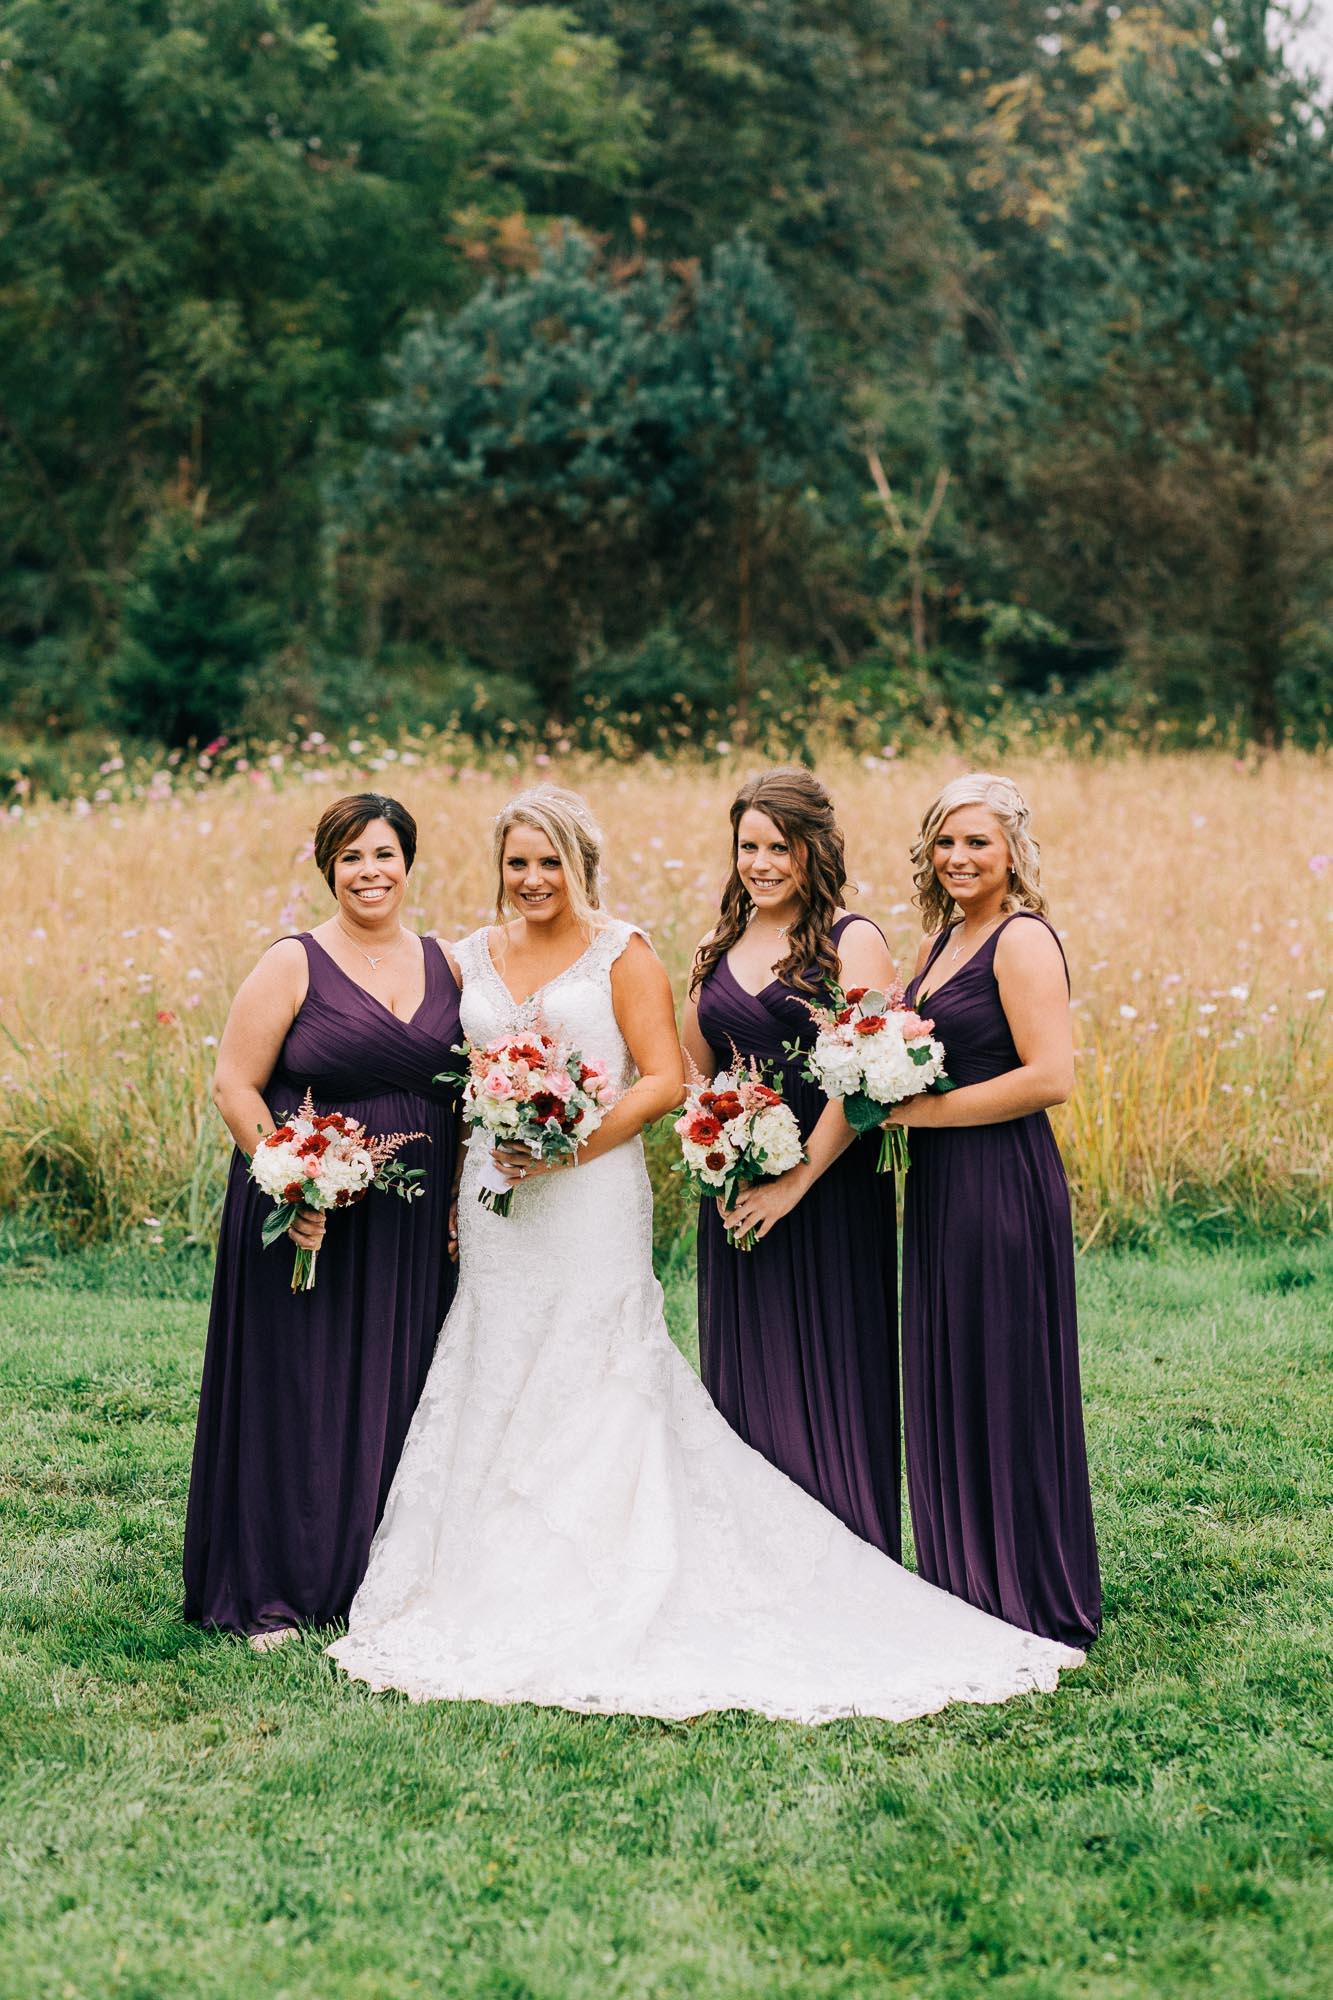 Lodge-at-Raven-Creek-October-wedding-48.jpg